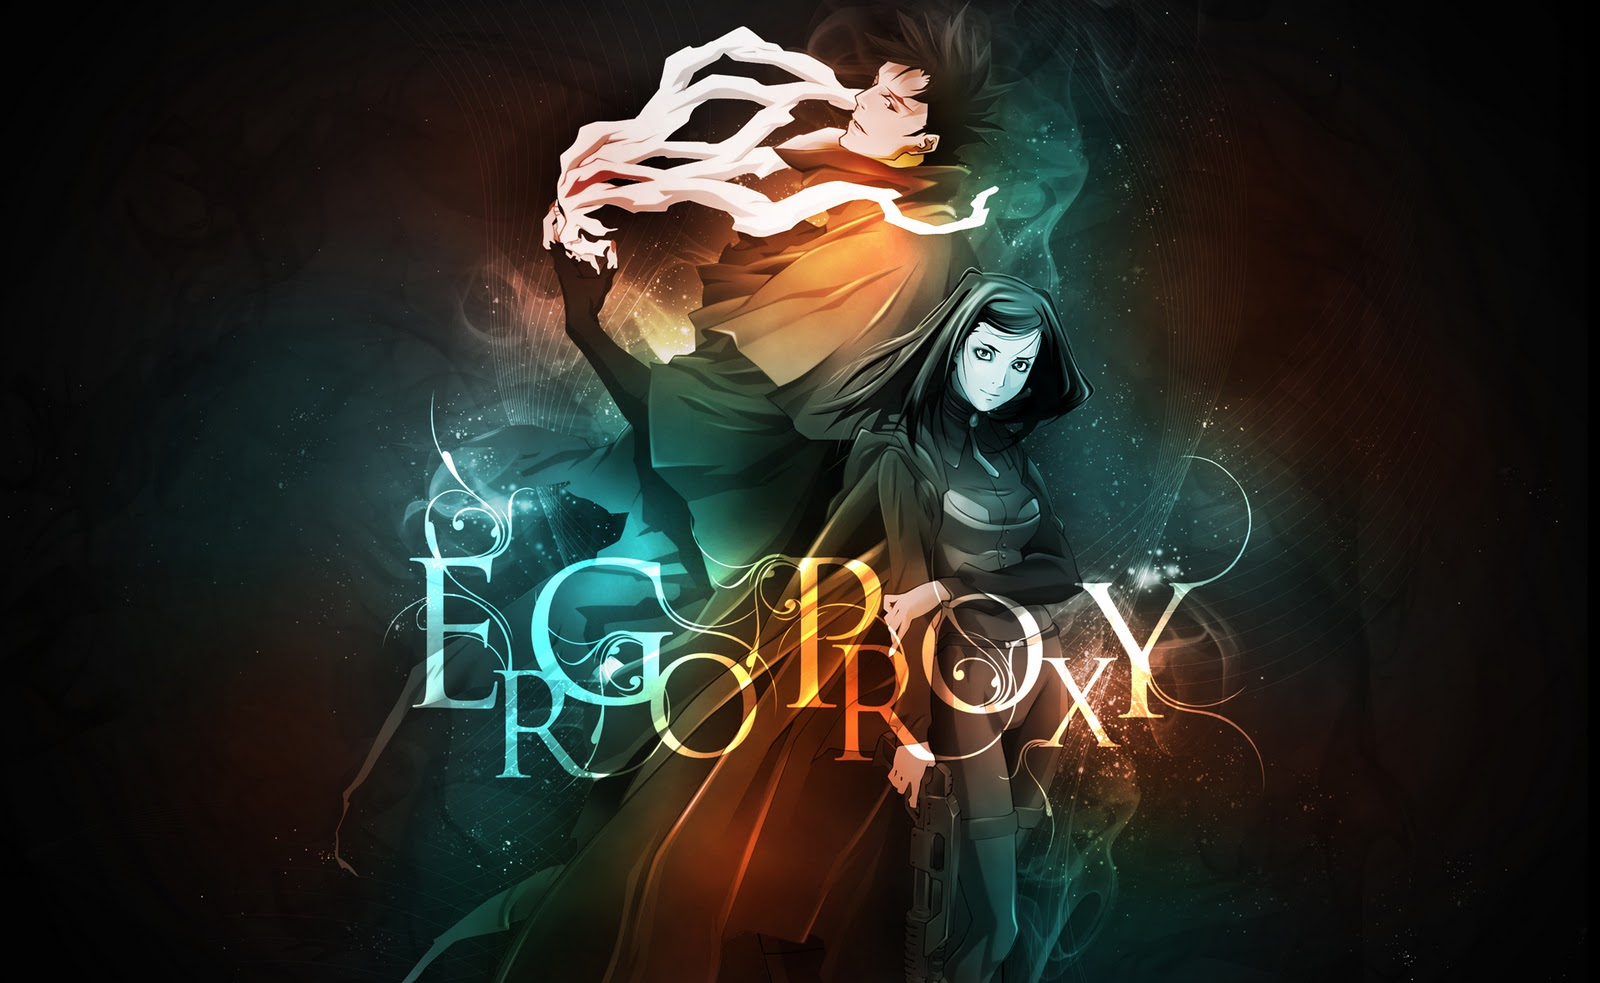 http://2.bp.blogspot.com/-xwzT98bmLmA/TfLEAnvBTtI/AAAAAAAABIk/6nfTMG7UrkM/s1600/ergo+proxy+-+045.jpg